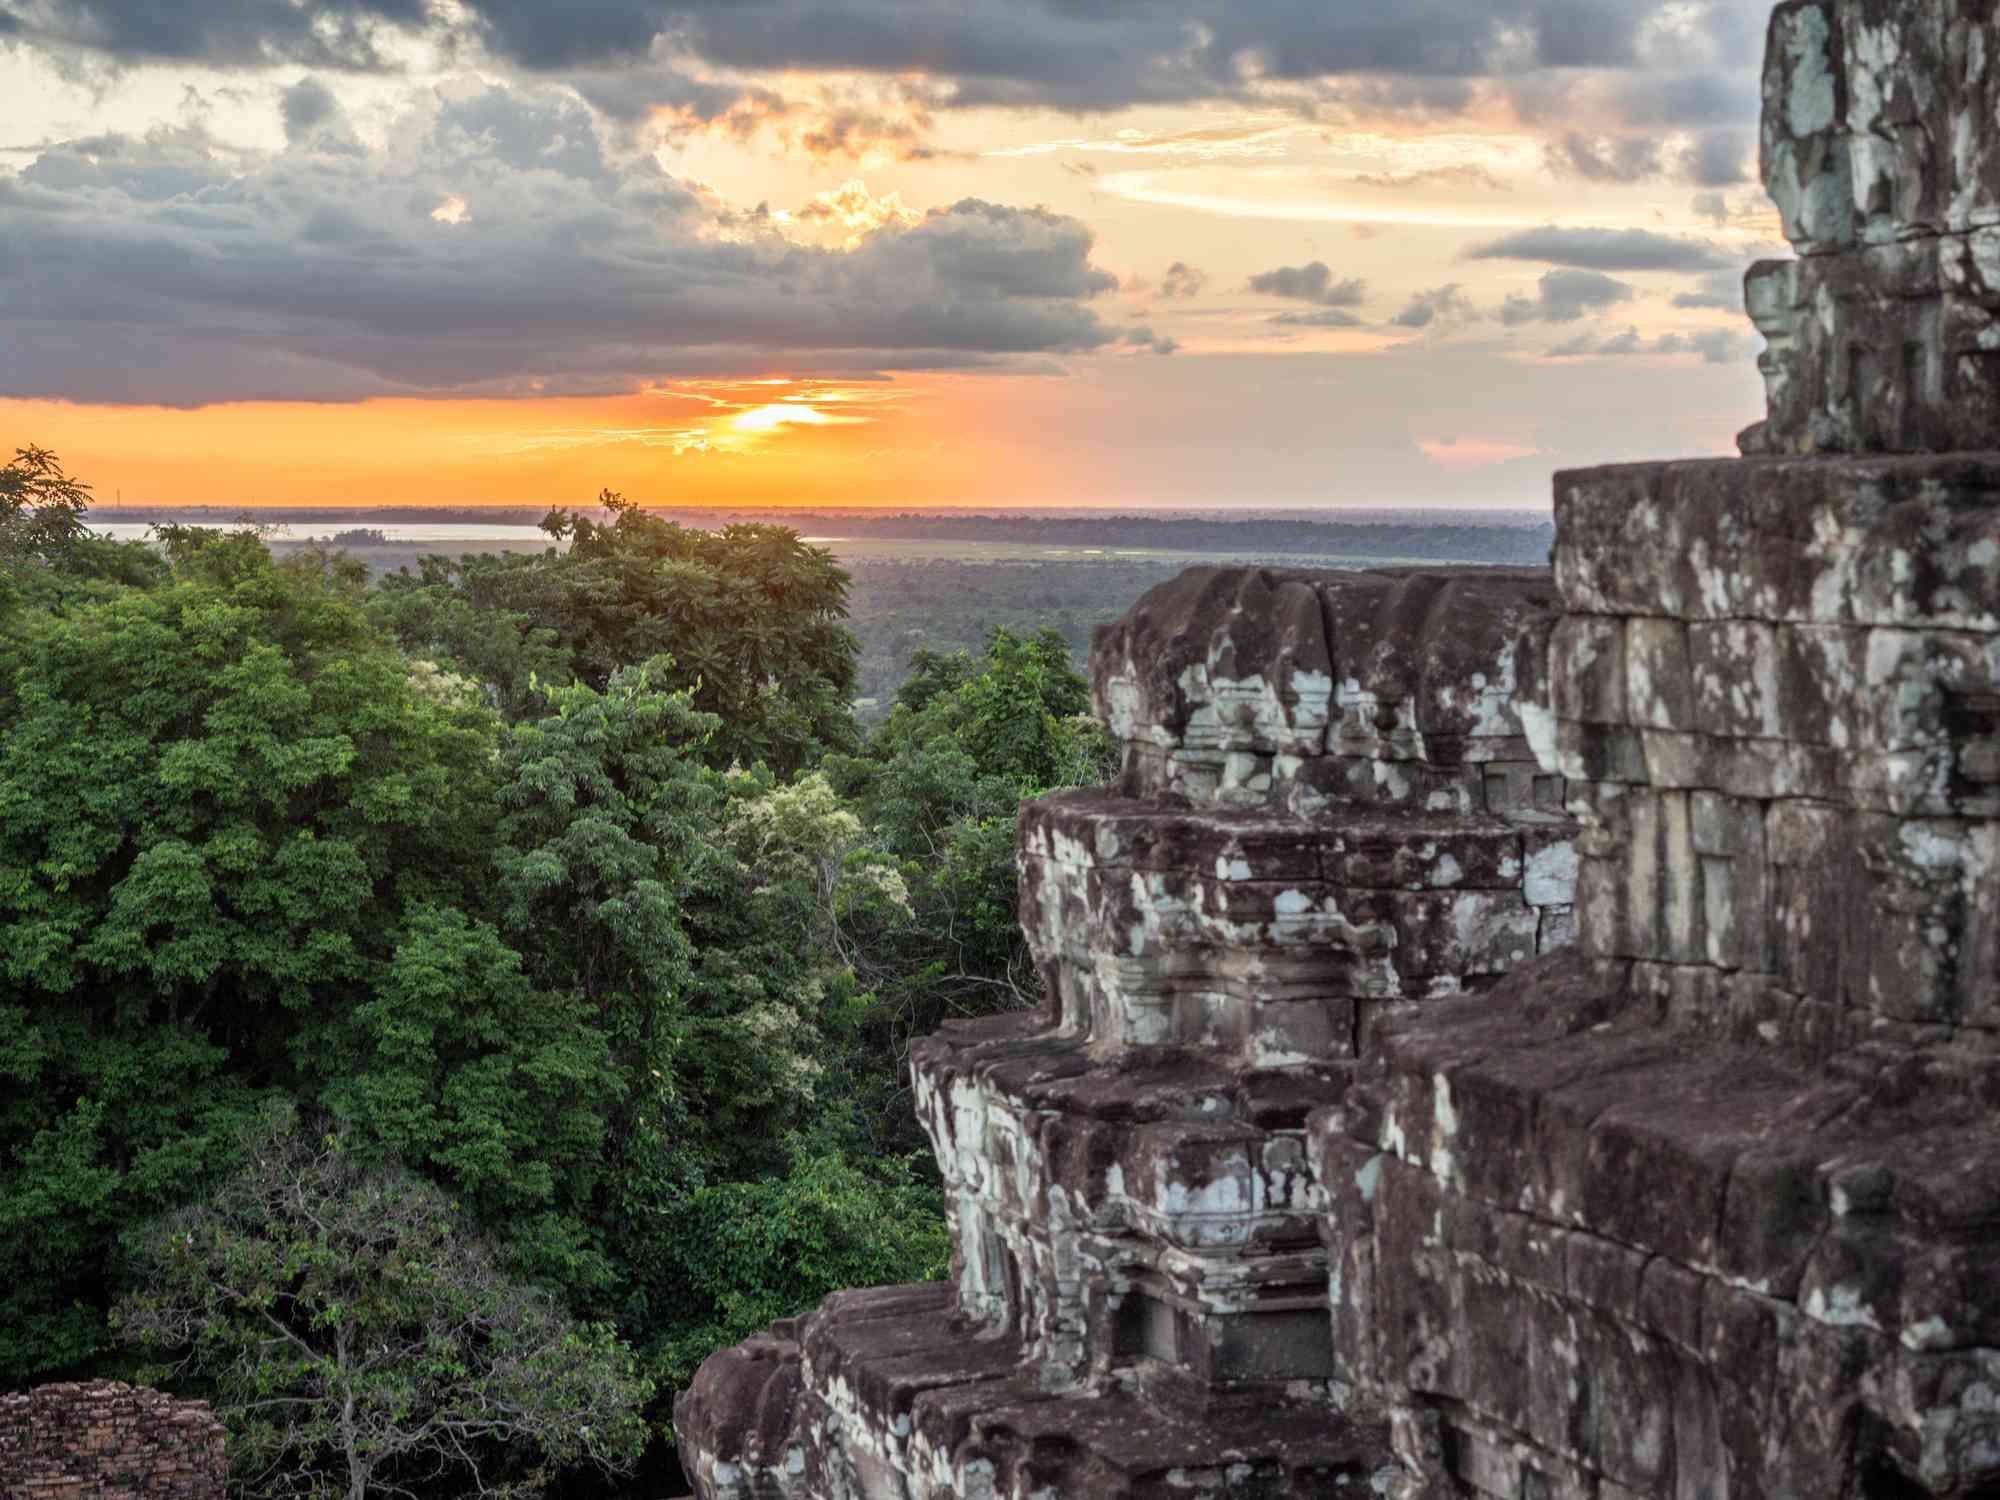 Sunset at Phnom Bakheng Angkor Siem Reap Temple